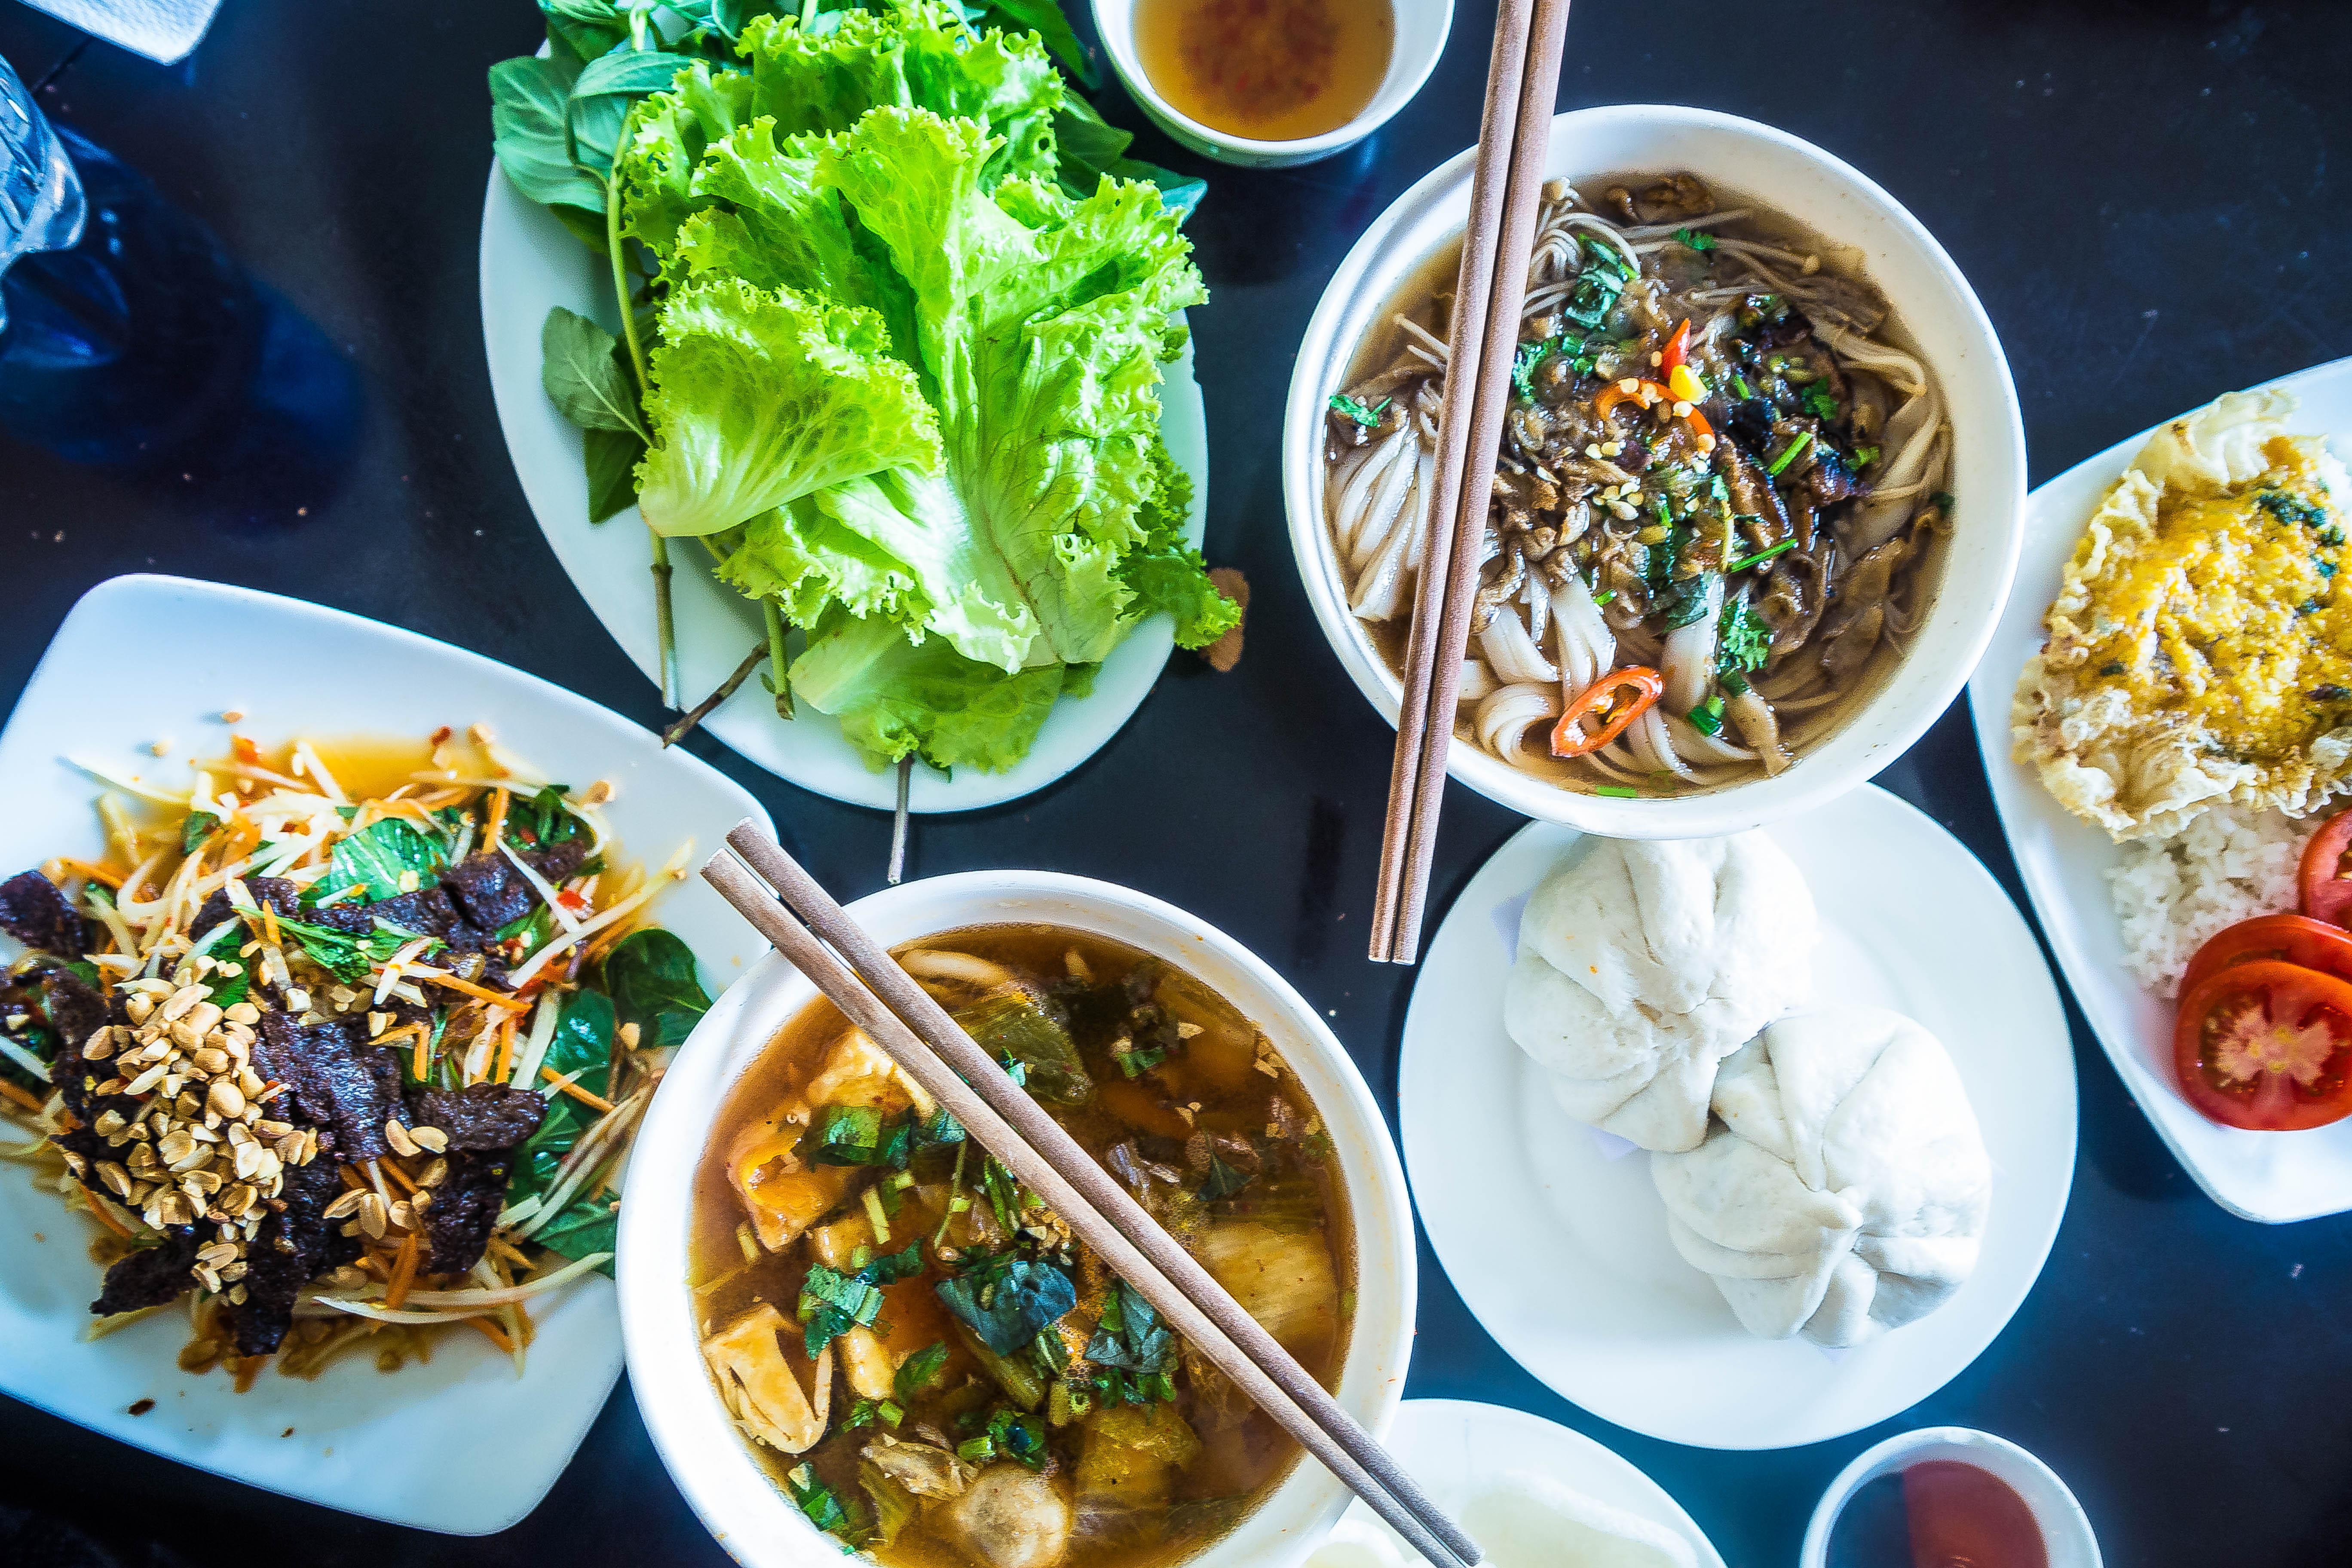 vietnam asian food vegan vietnamese broth chilli spices vegan delicious cheap healthy